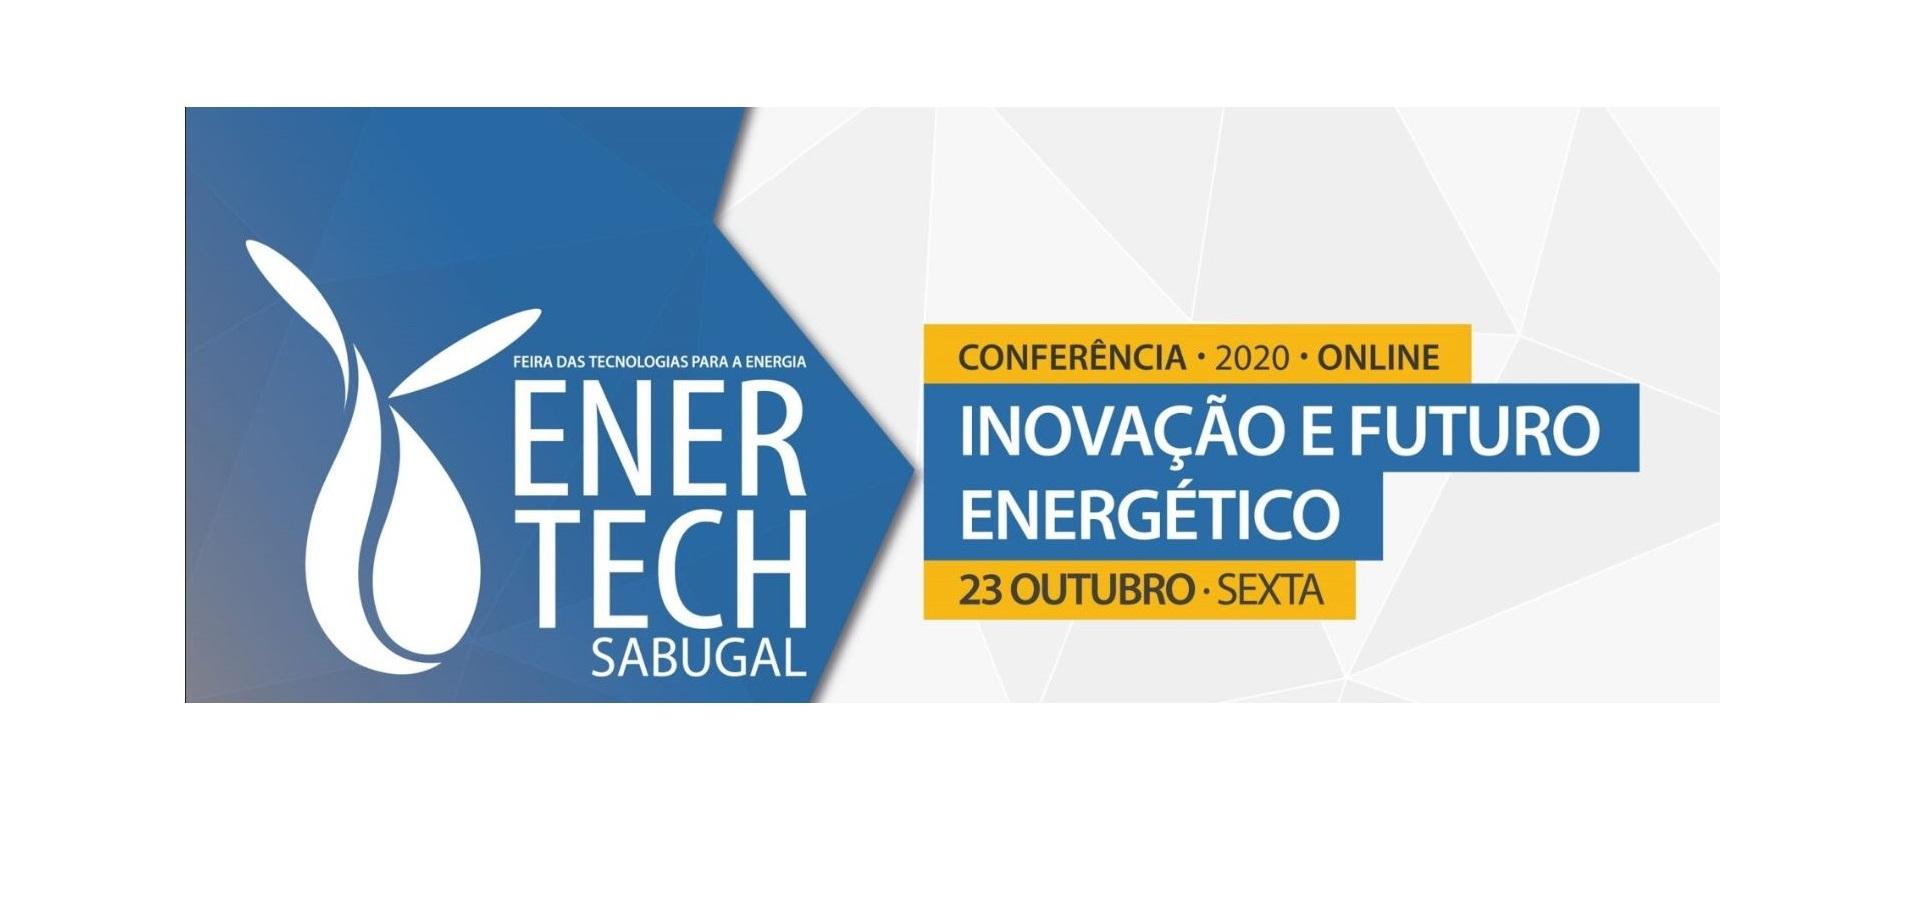 enertech-2020-conferencia-online-inovacao-e-futuro-energetico